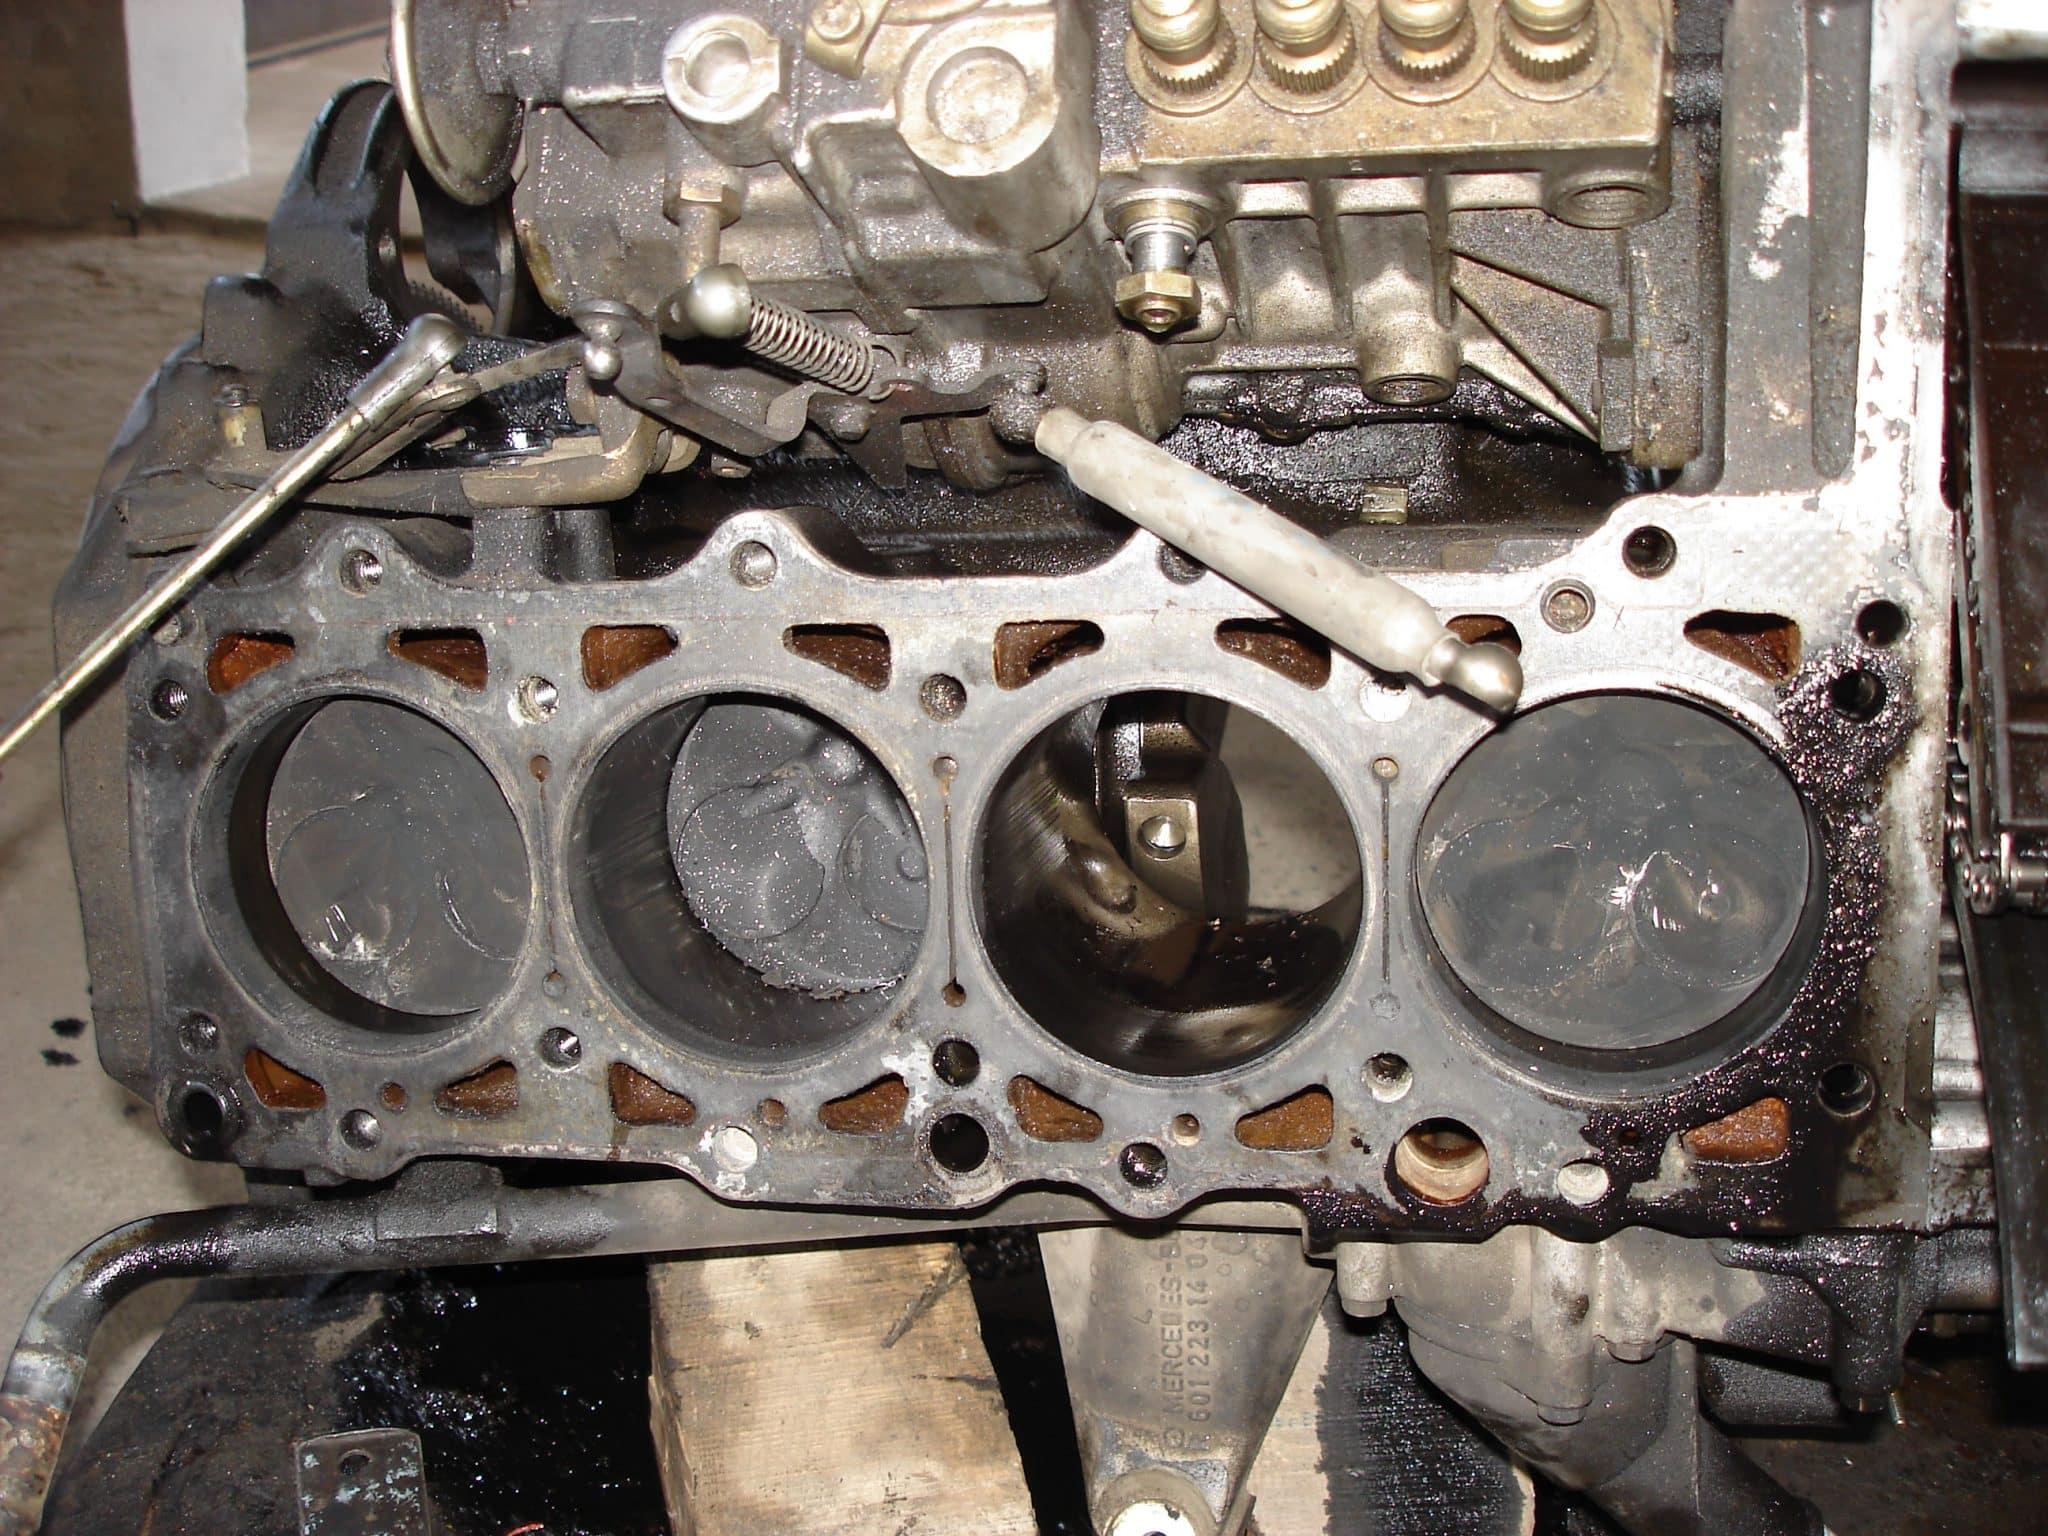 1974 porsche 914 repair manual pdf